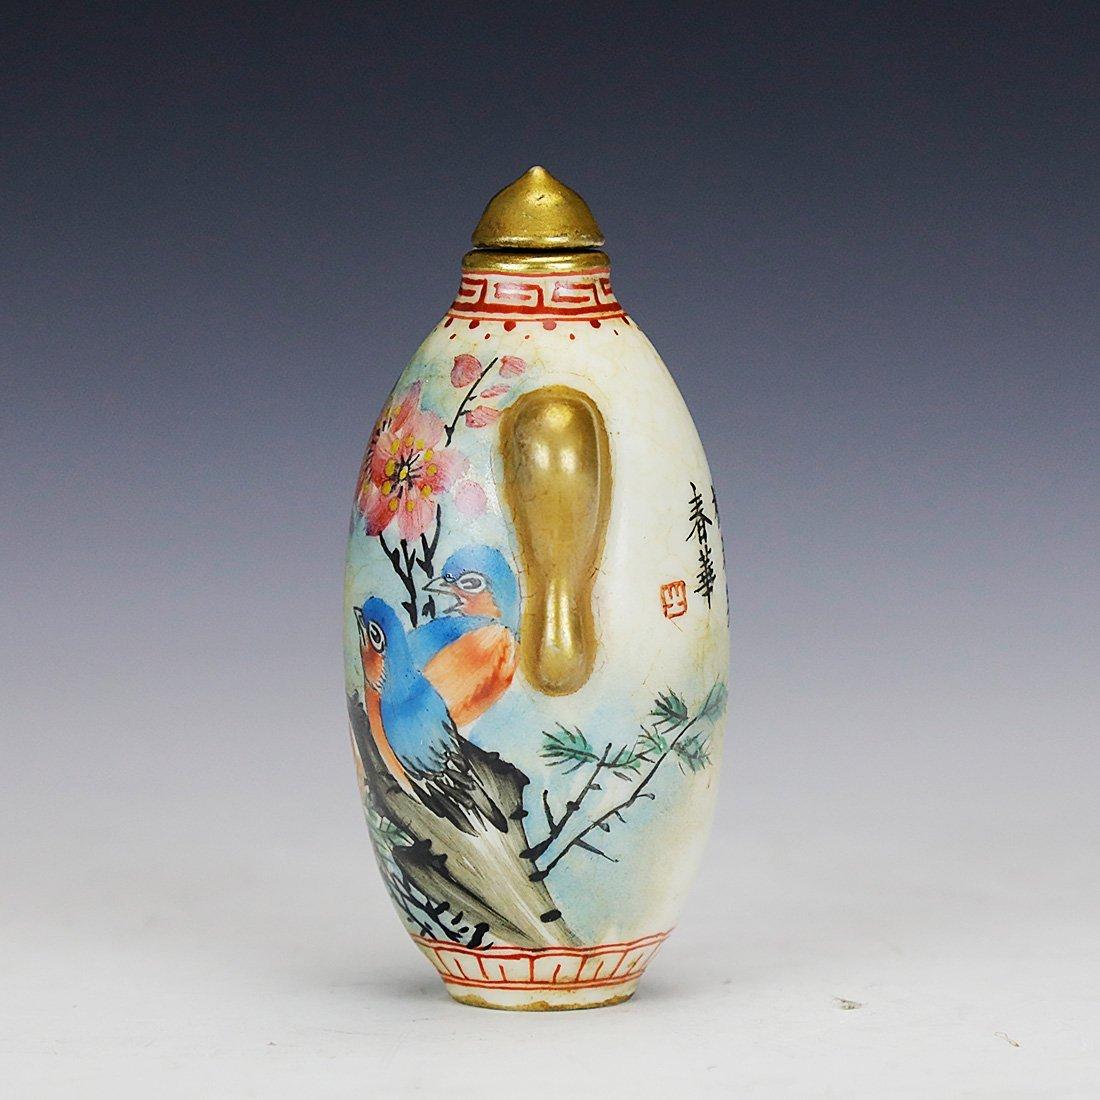 Handmade flower and bird ceramic snuff bottle,Qian Long - 2